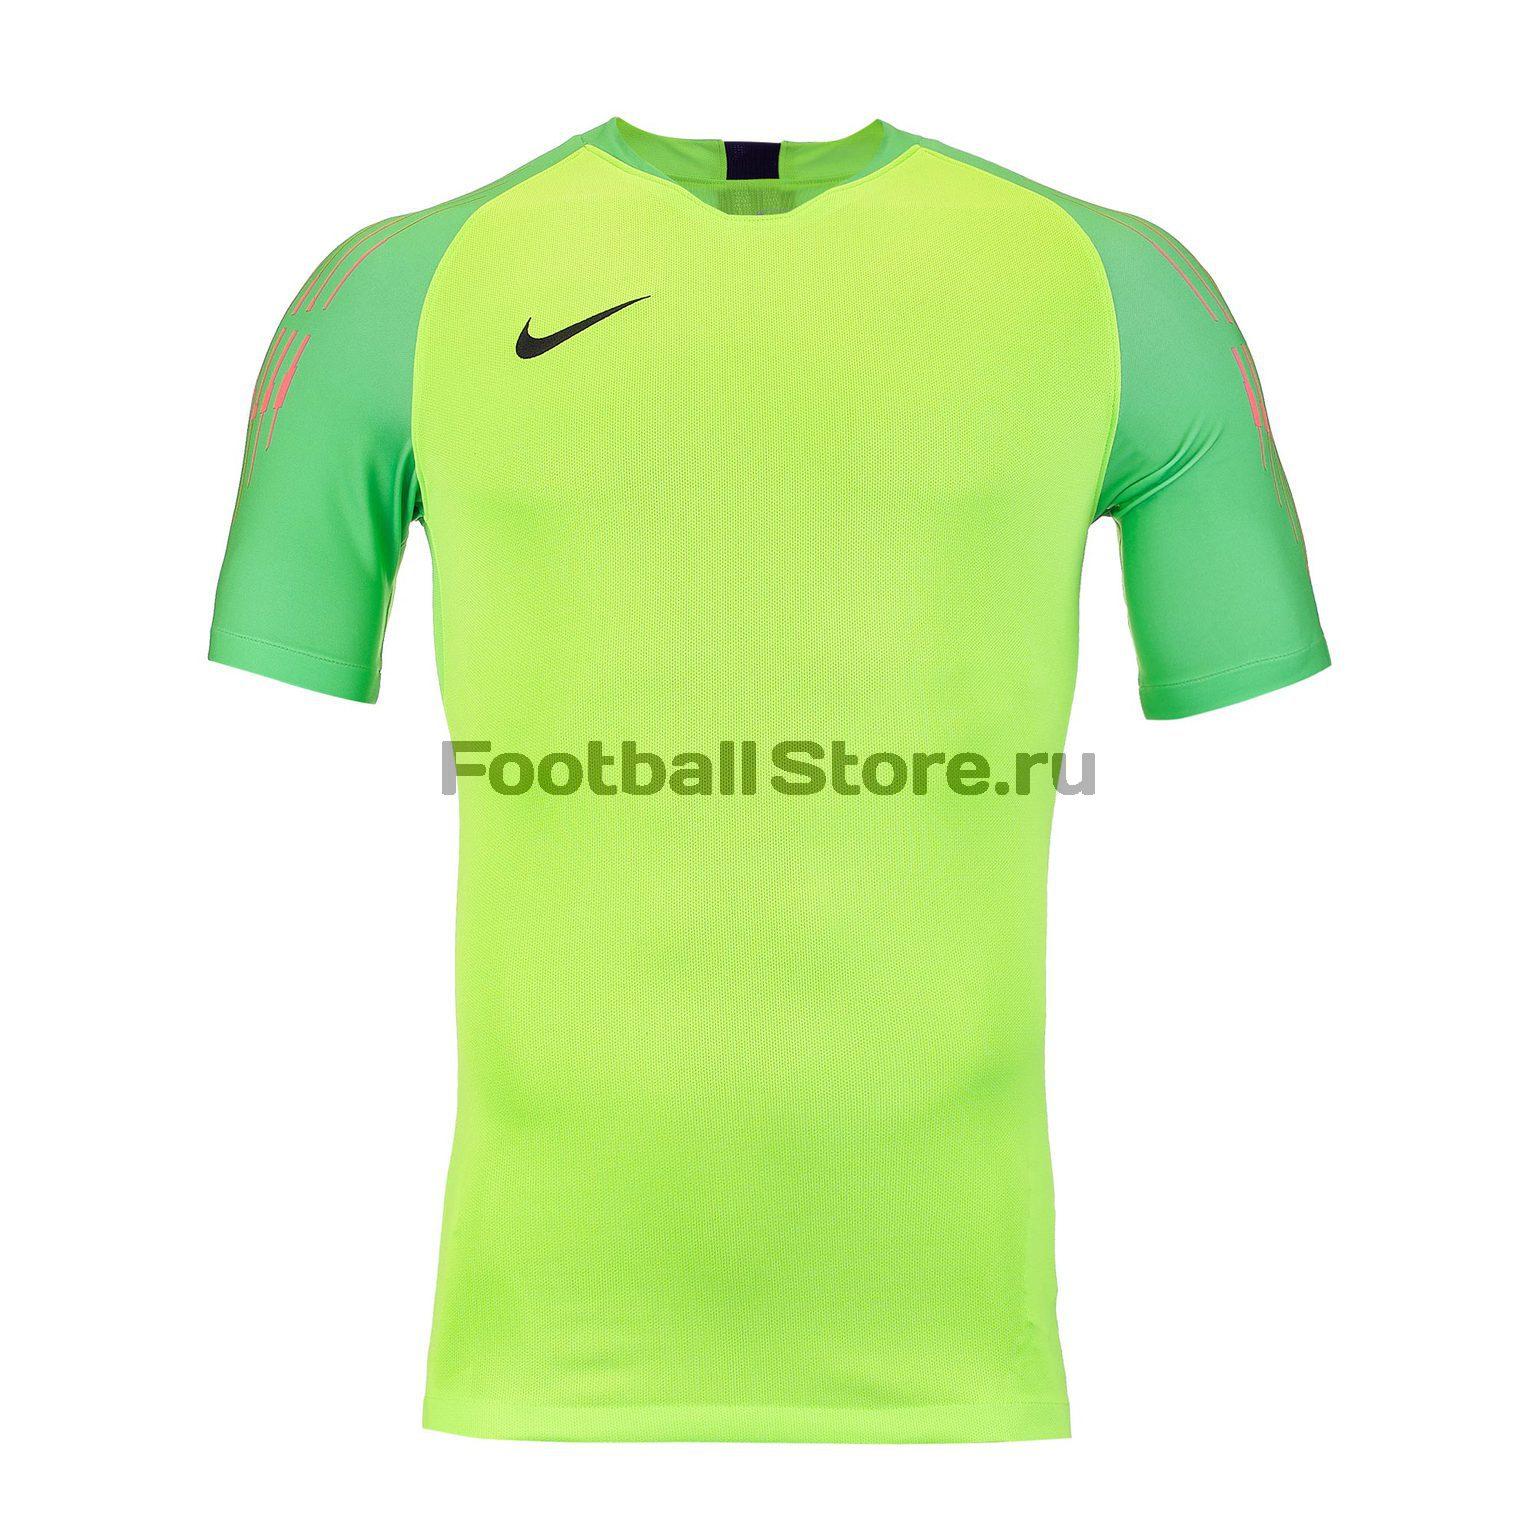 Вратарская футболка Nike Gardien II GK SS 894512-398